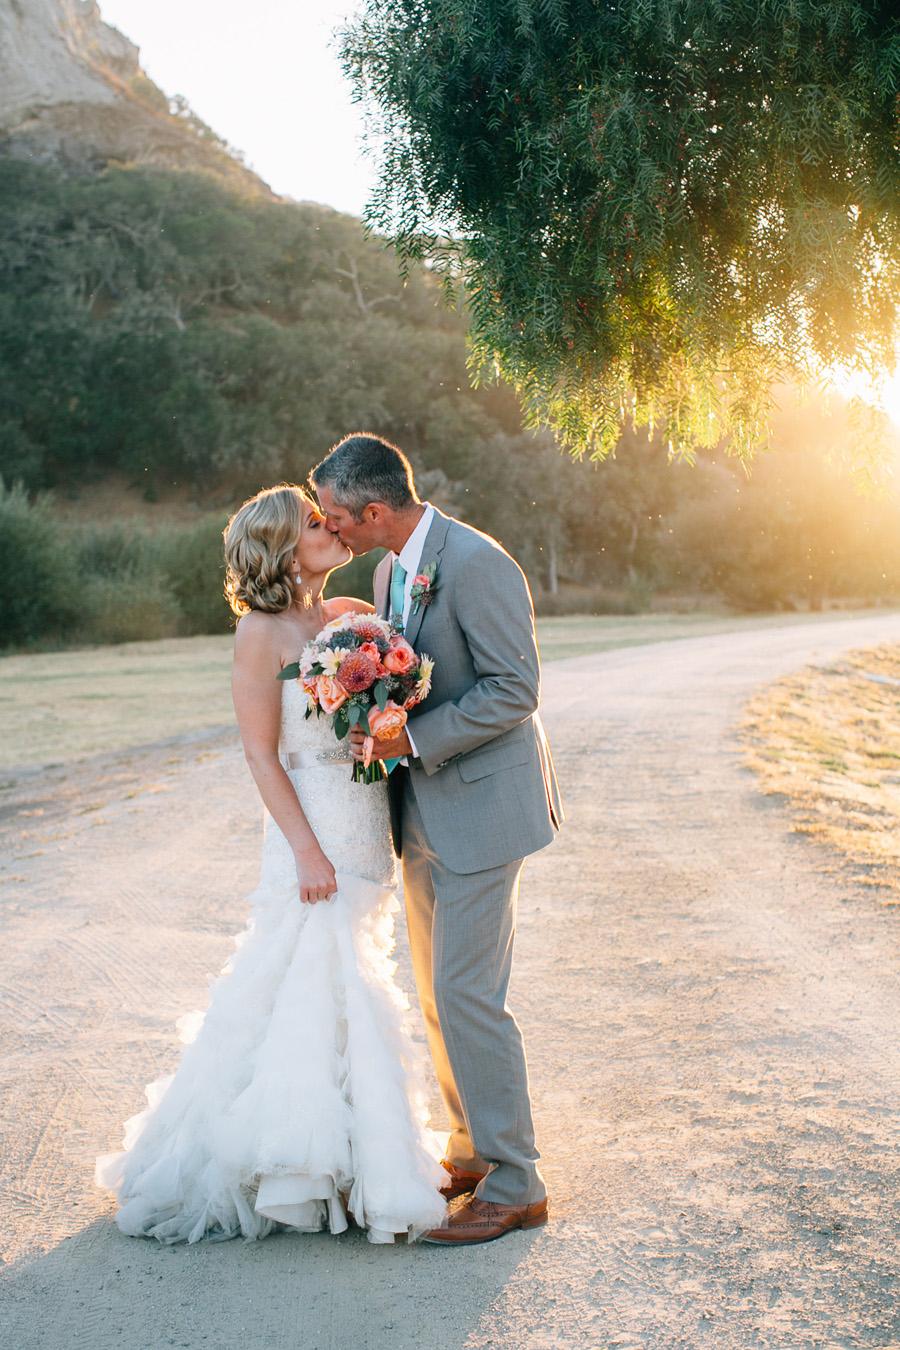 Jen_Rodriguez-Holland_Ranch_wedding52.JPG